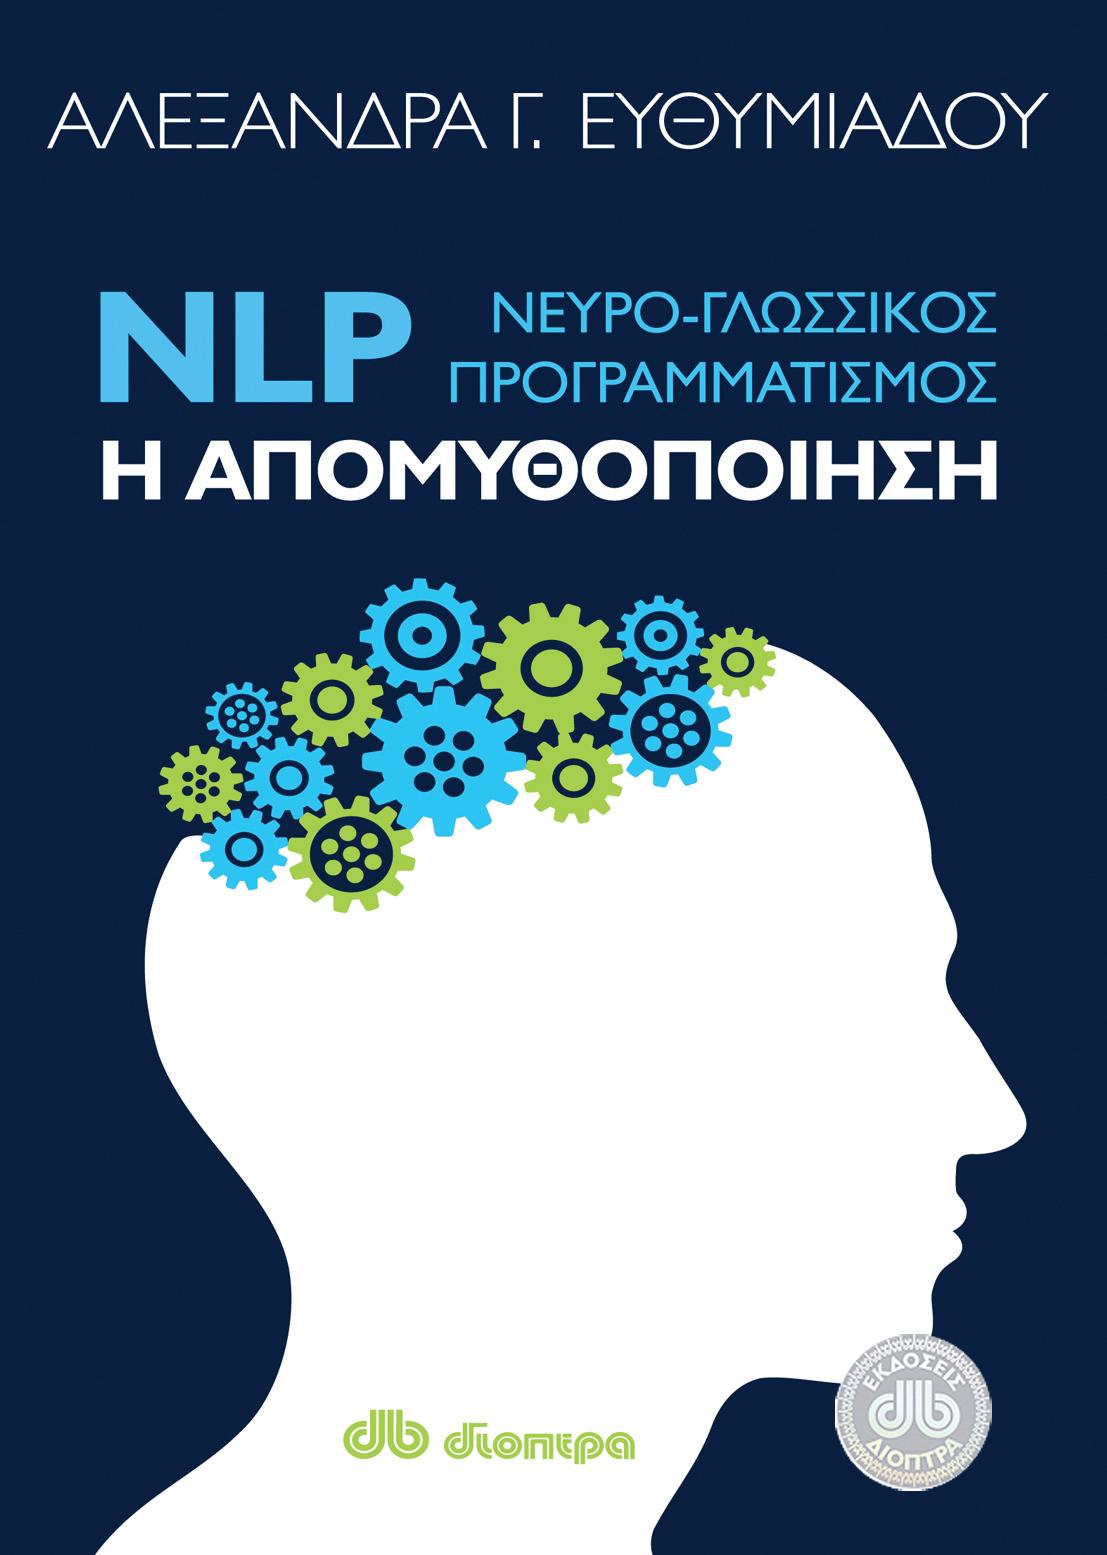 Nlp - Νευρό-Γλωσσικός Προγραμματισμός